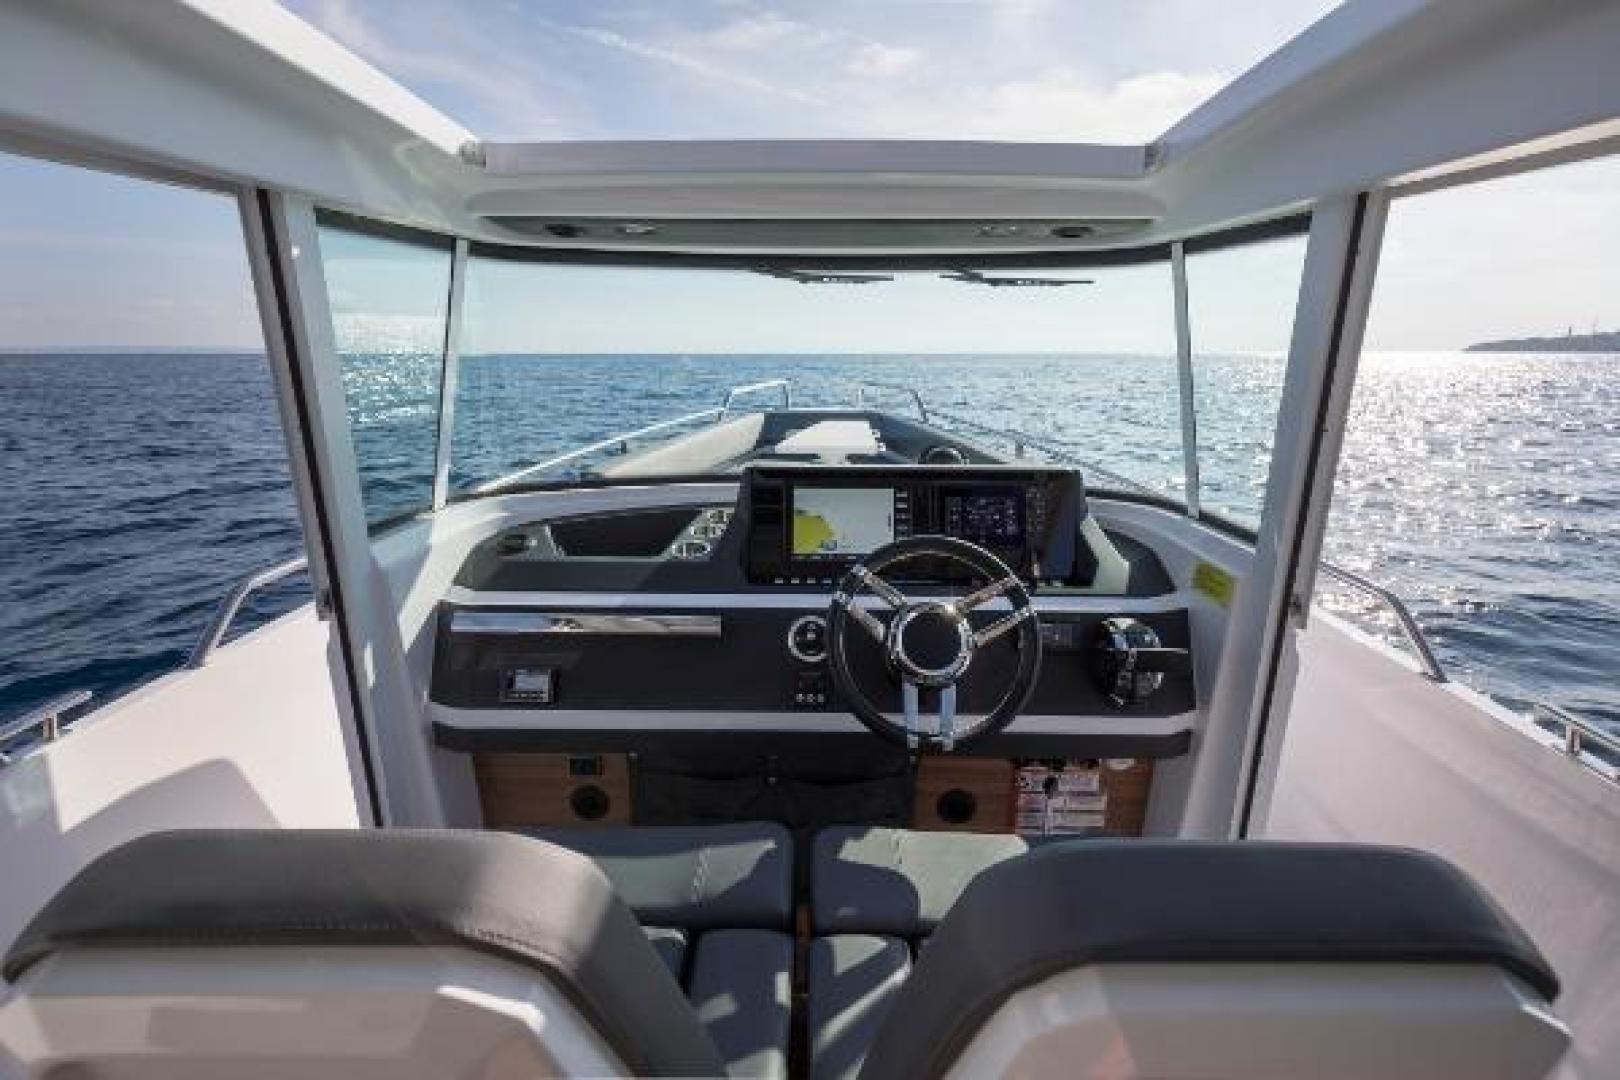 Axopar-28 CABIN 2021-Axopar 28 CABIN Tampa Bay-Florida-United States-1531688 | Thumbnail